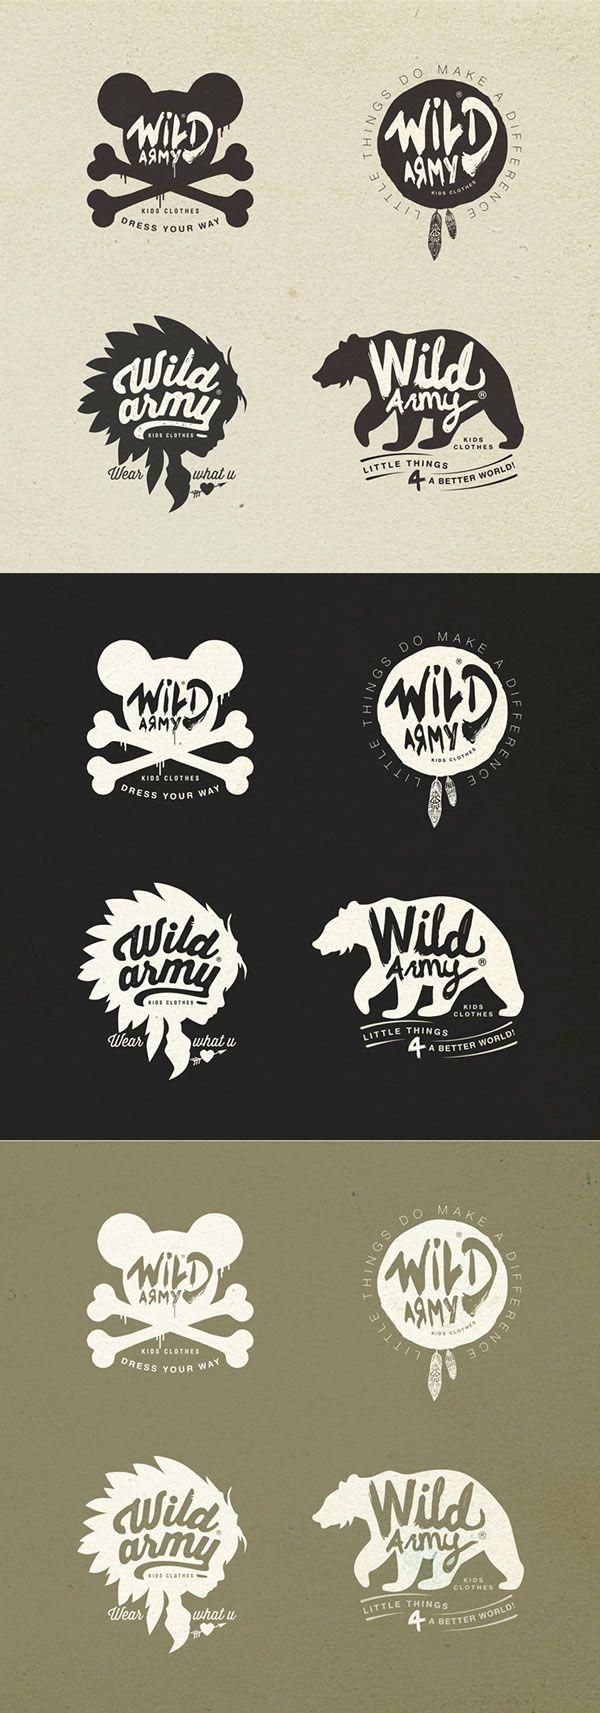 Wild Army, Kids Revel Clothes on Behance | Retro & Vintage Badges | Pinterest | Army, Behance ...